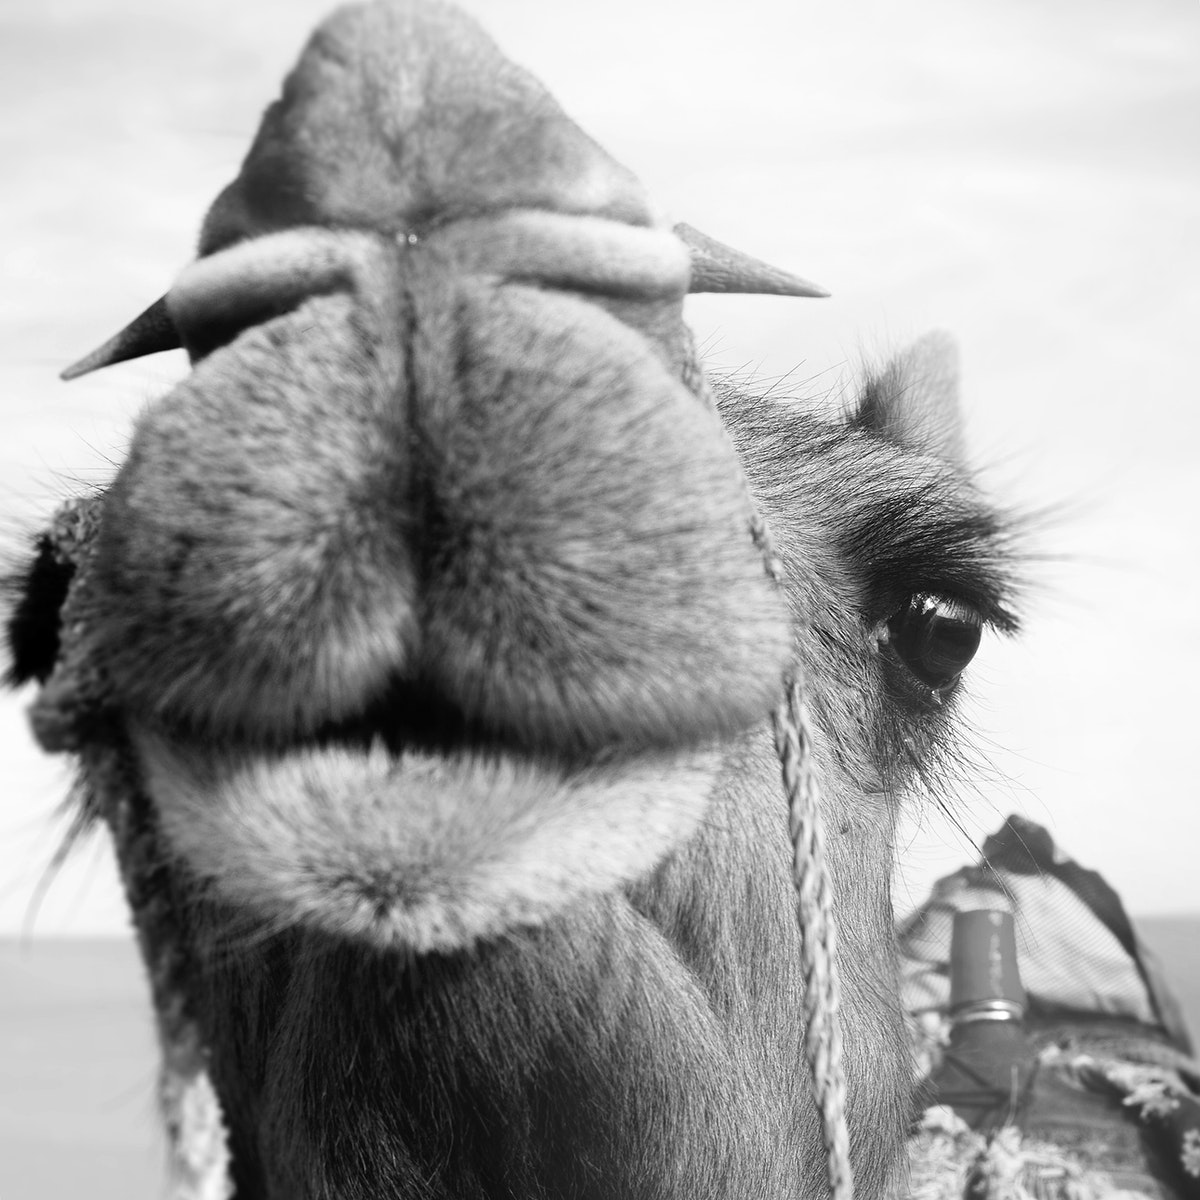 Closeup of camel grayscale